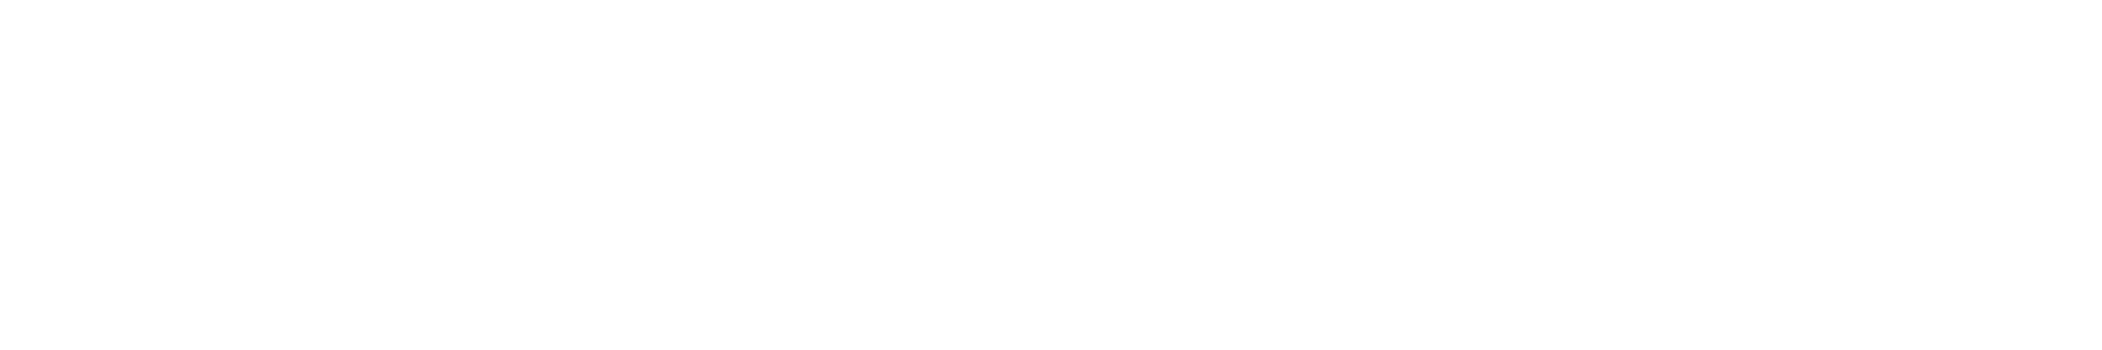 SUPERFAB - hatchline - white_2x.png